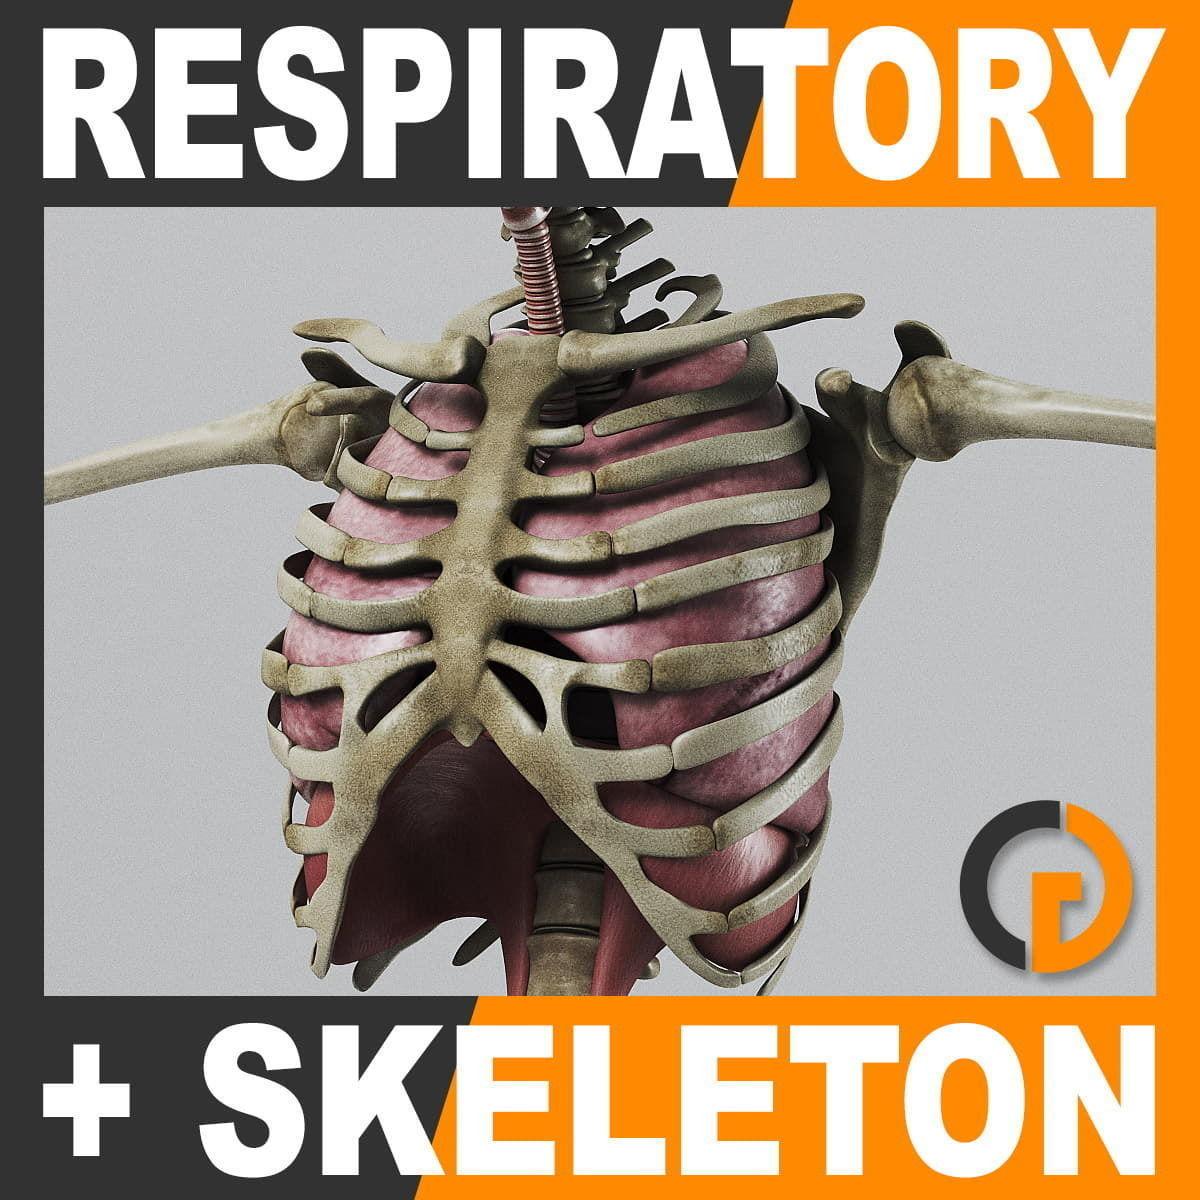 Human Respiratory System and Skeleton - Anatomy